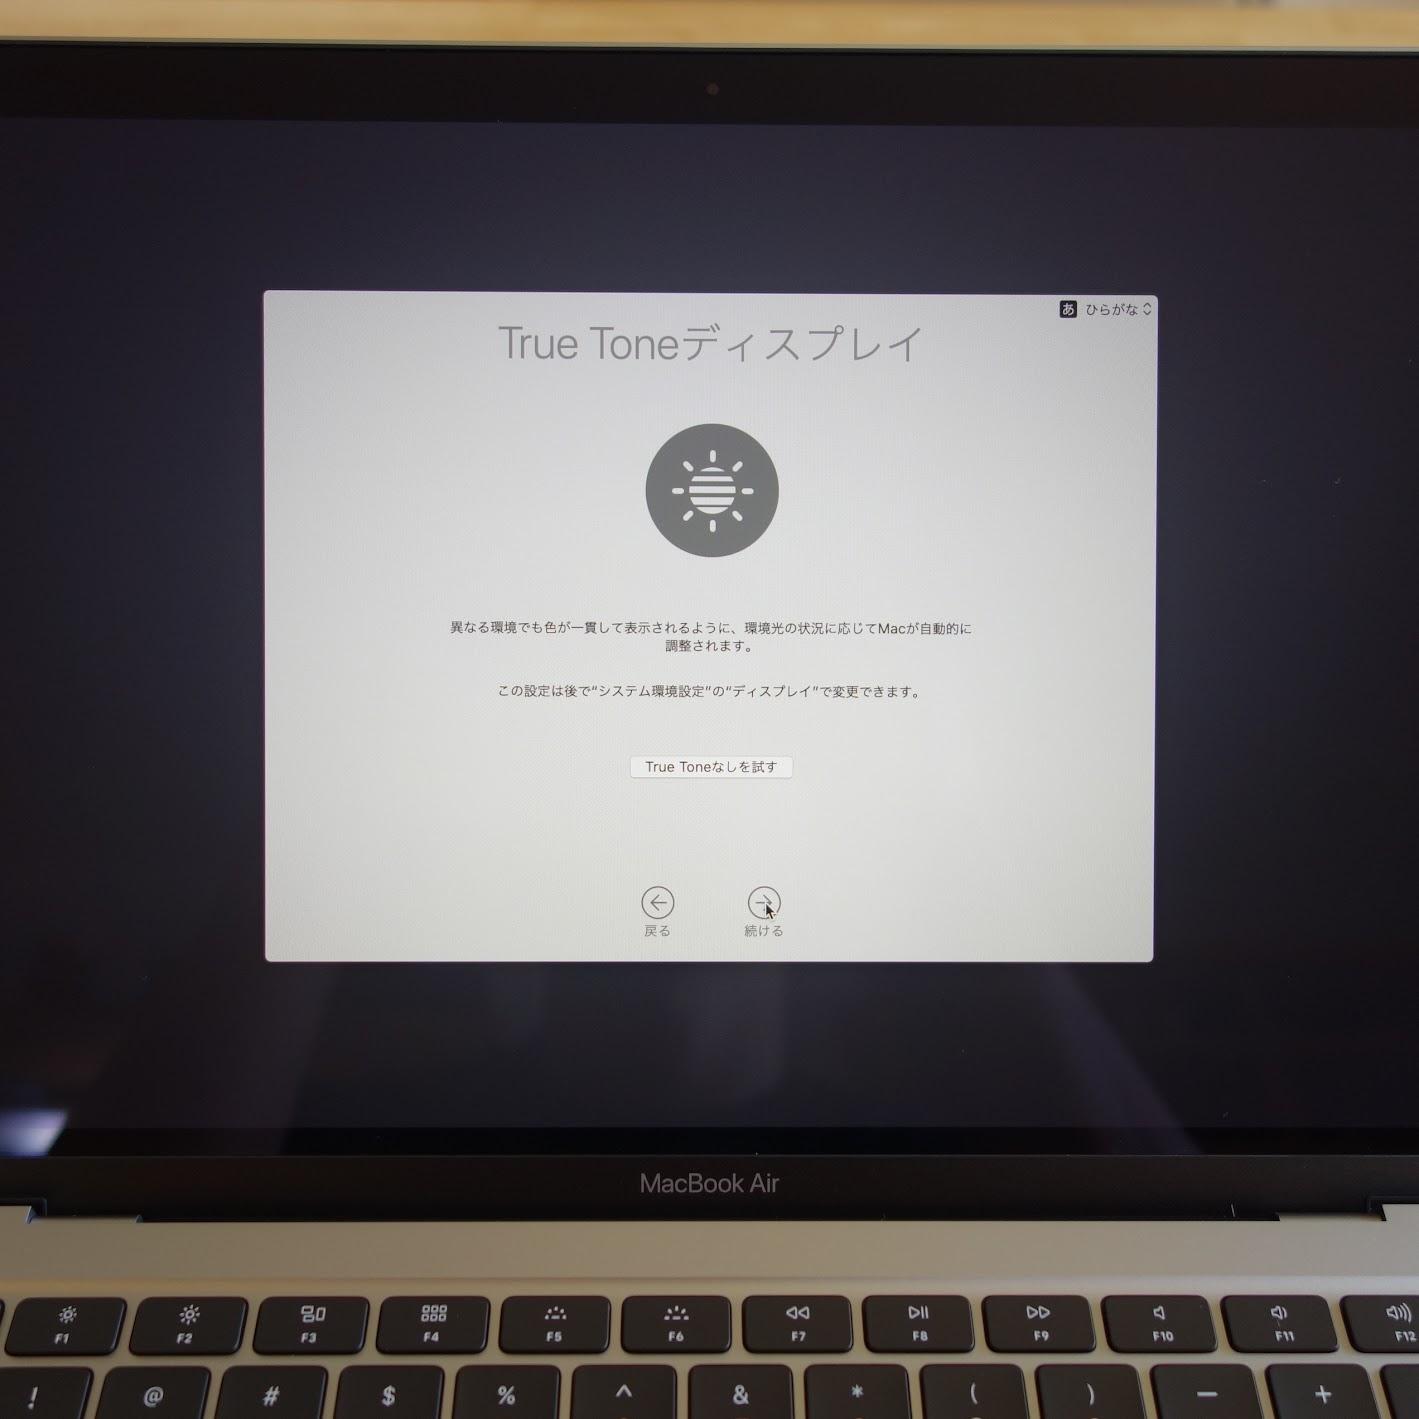 MacBook Air True Toneディスプレイ